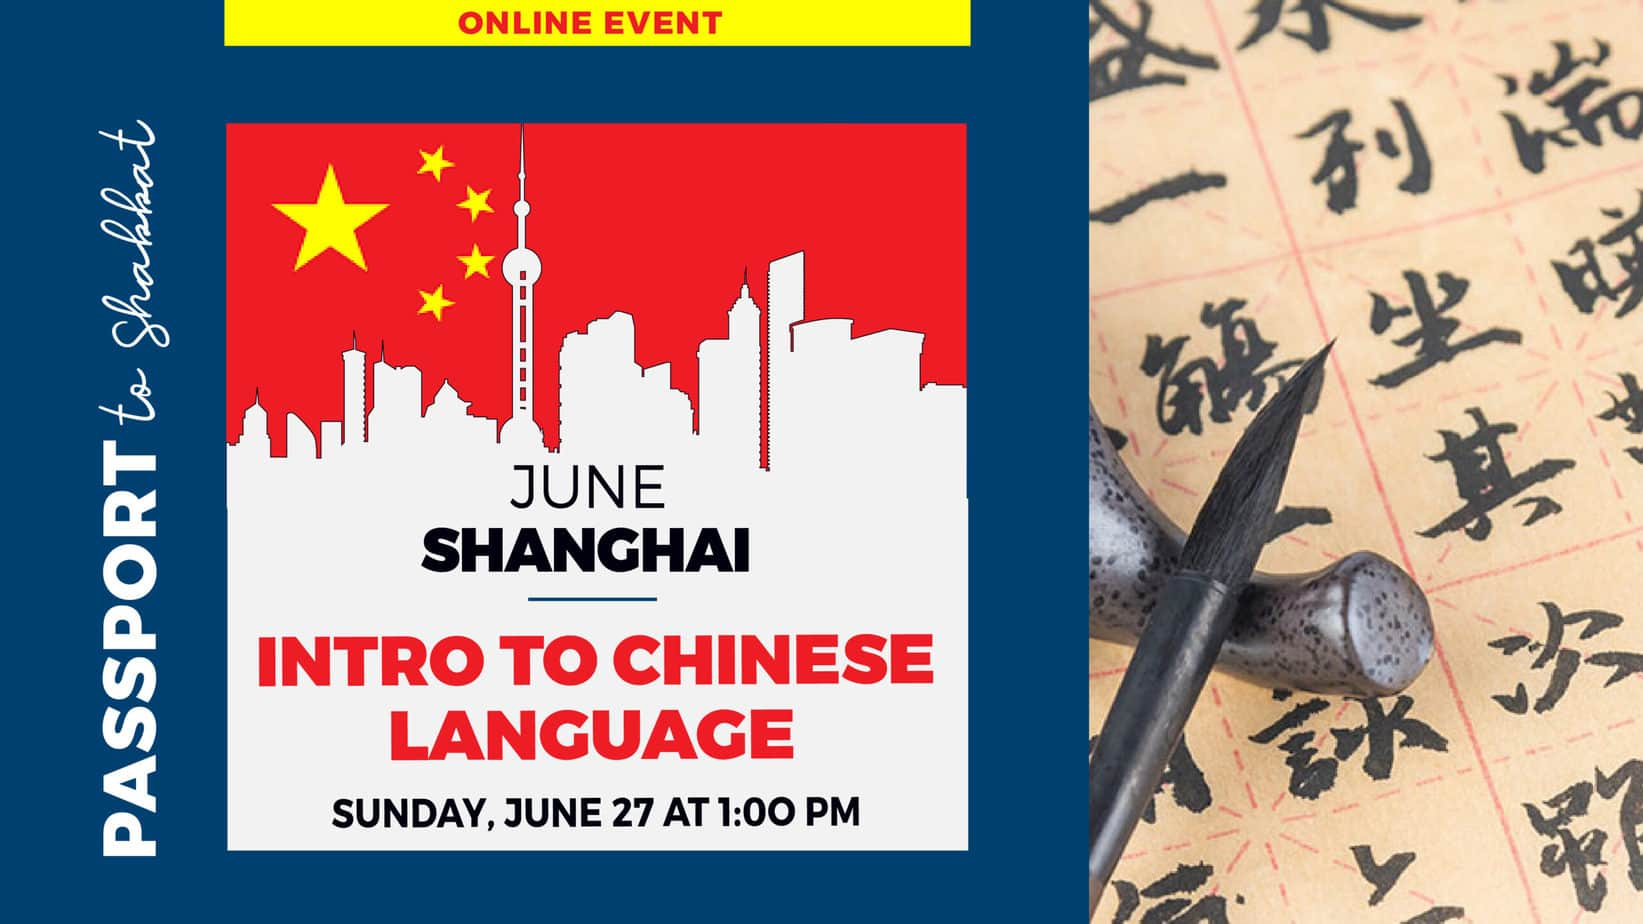 Social Media June 27 -online event